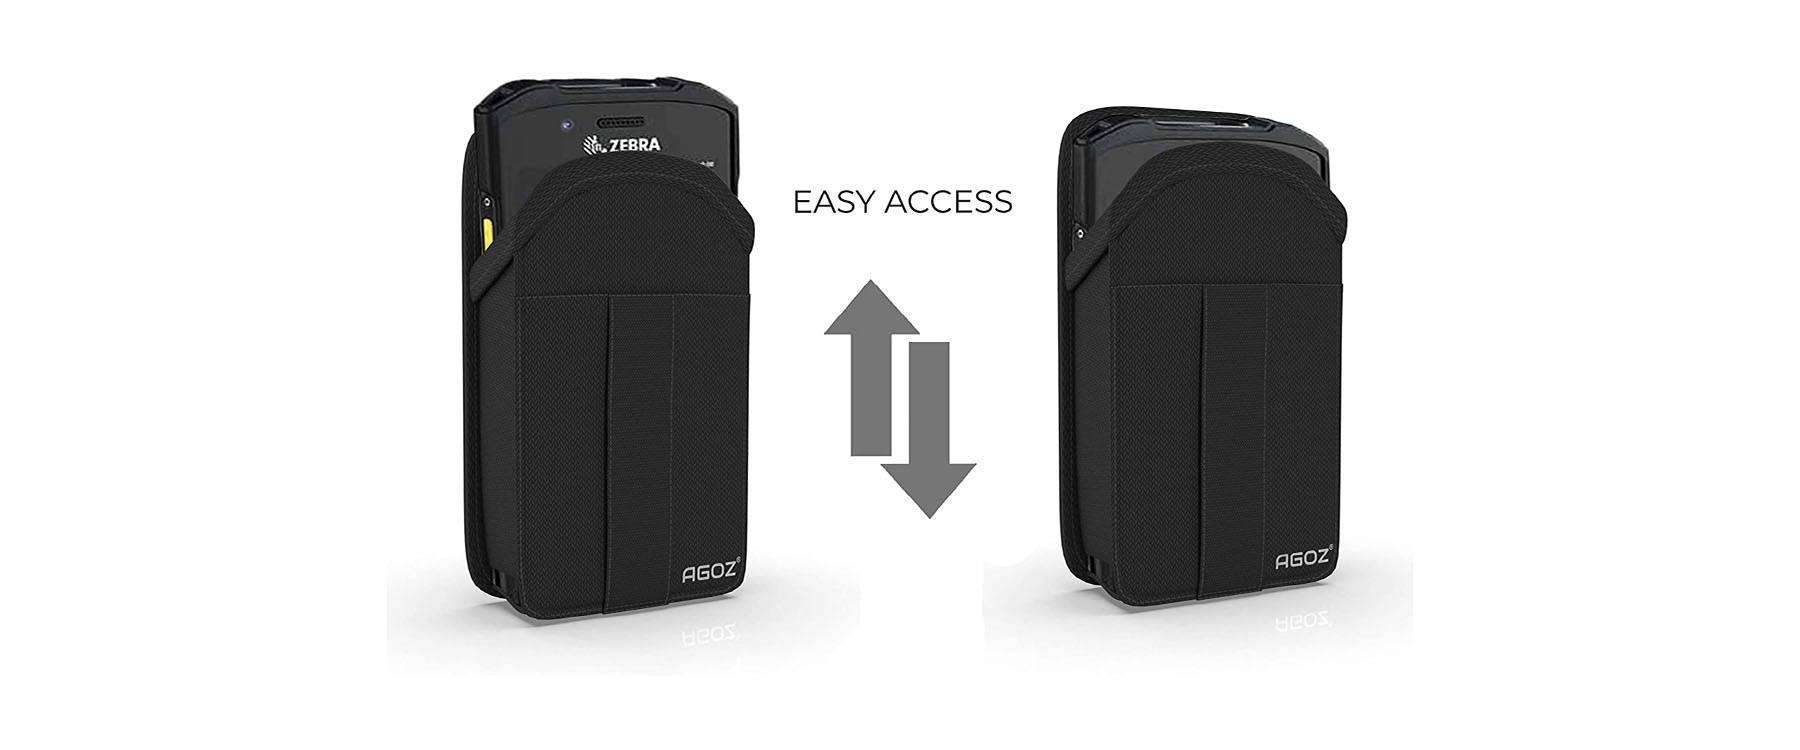 Zebra Scanner Case is compatible with Zebra TC77, TC75/75X, TC72, TC70/TC70X, TC57, TC56, TC55, TC52, TC51, TC26, TC21, MC40/MC45, M60, CS3000, CS4070.